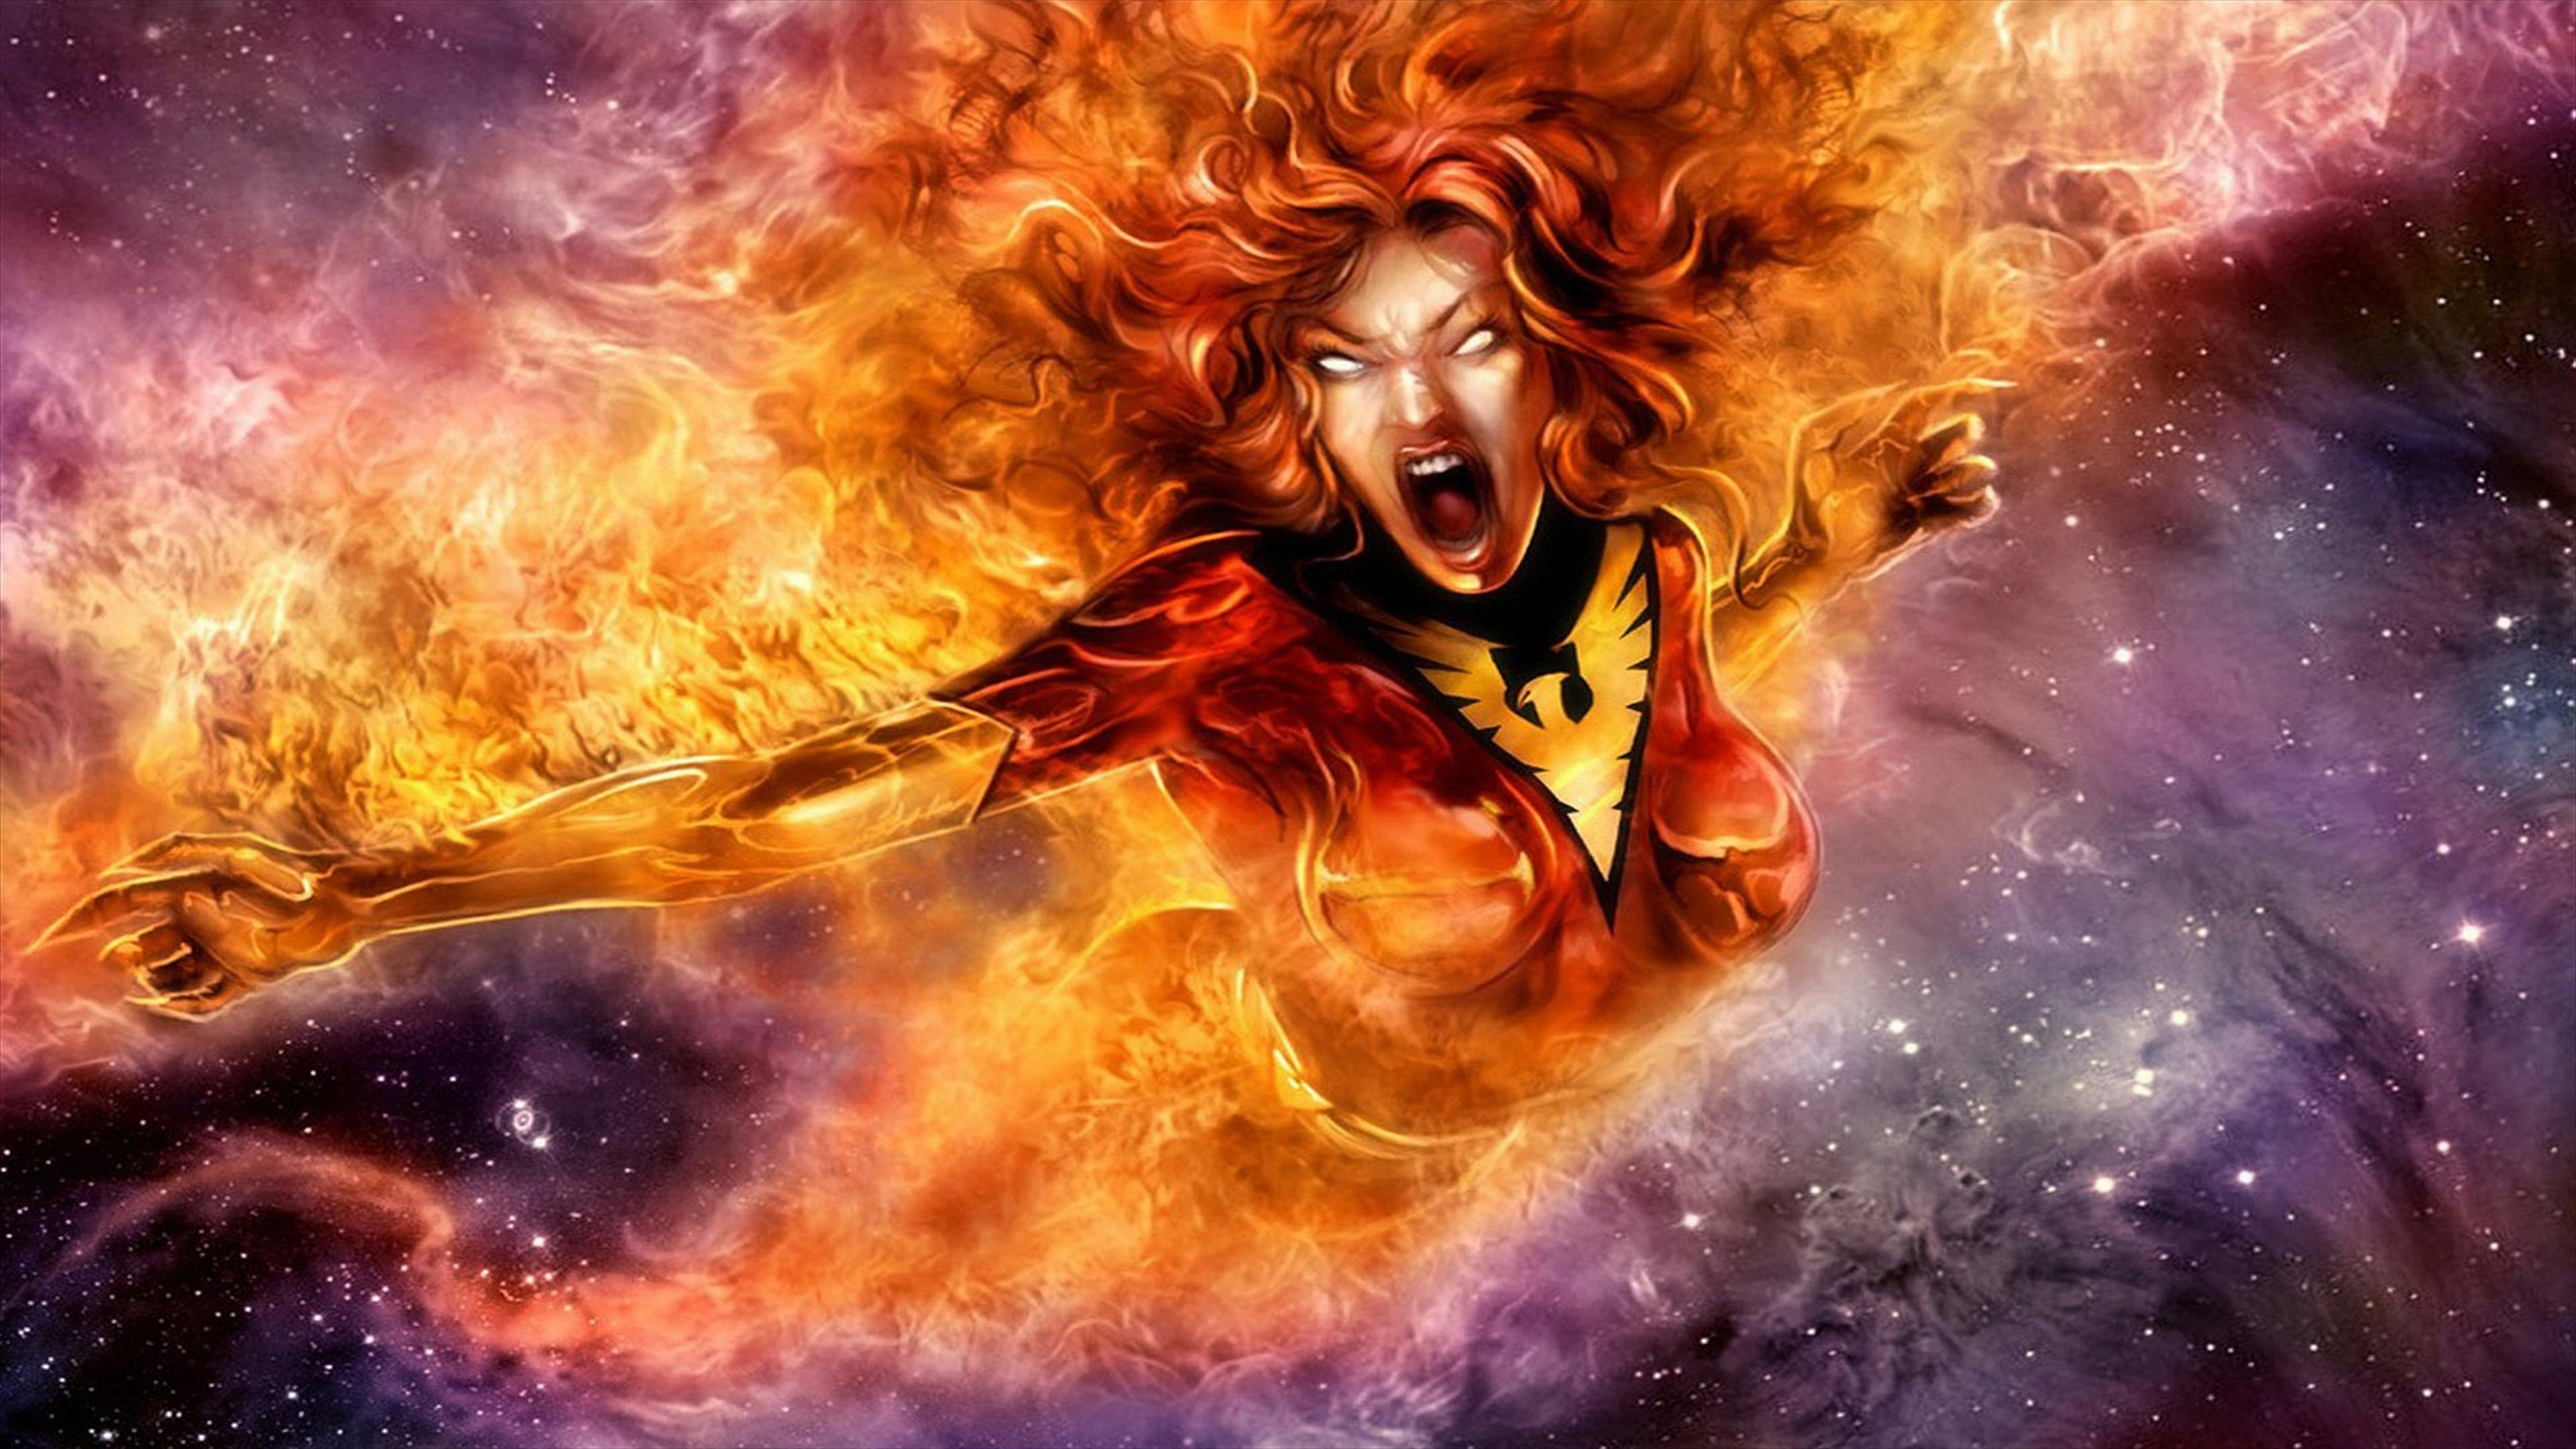 Jean grey phoenix comic character hd superheroes 4k - Wallpaper jean grey ...